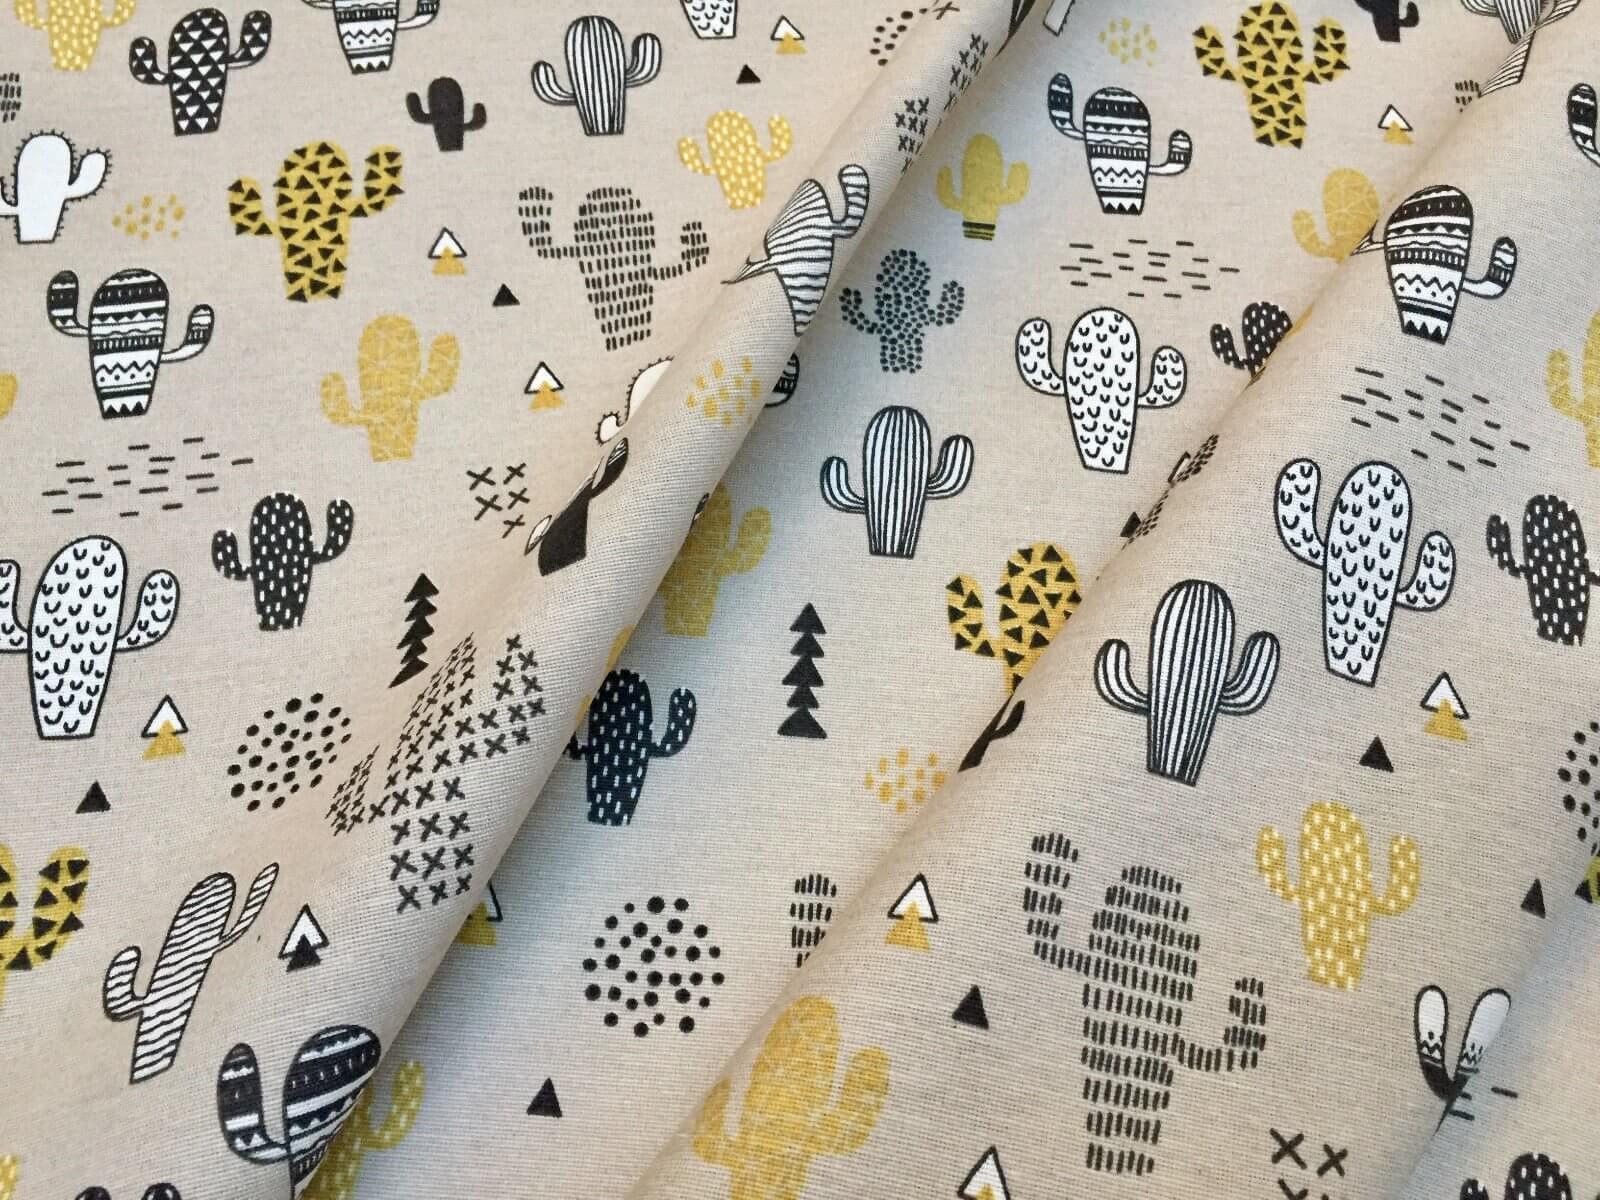 mustard-black-cactus-fabric-cacti-print-kid-curtain-cotton-material-55-inches-wide-5b4cae9f3.jpg